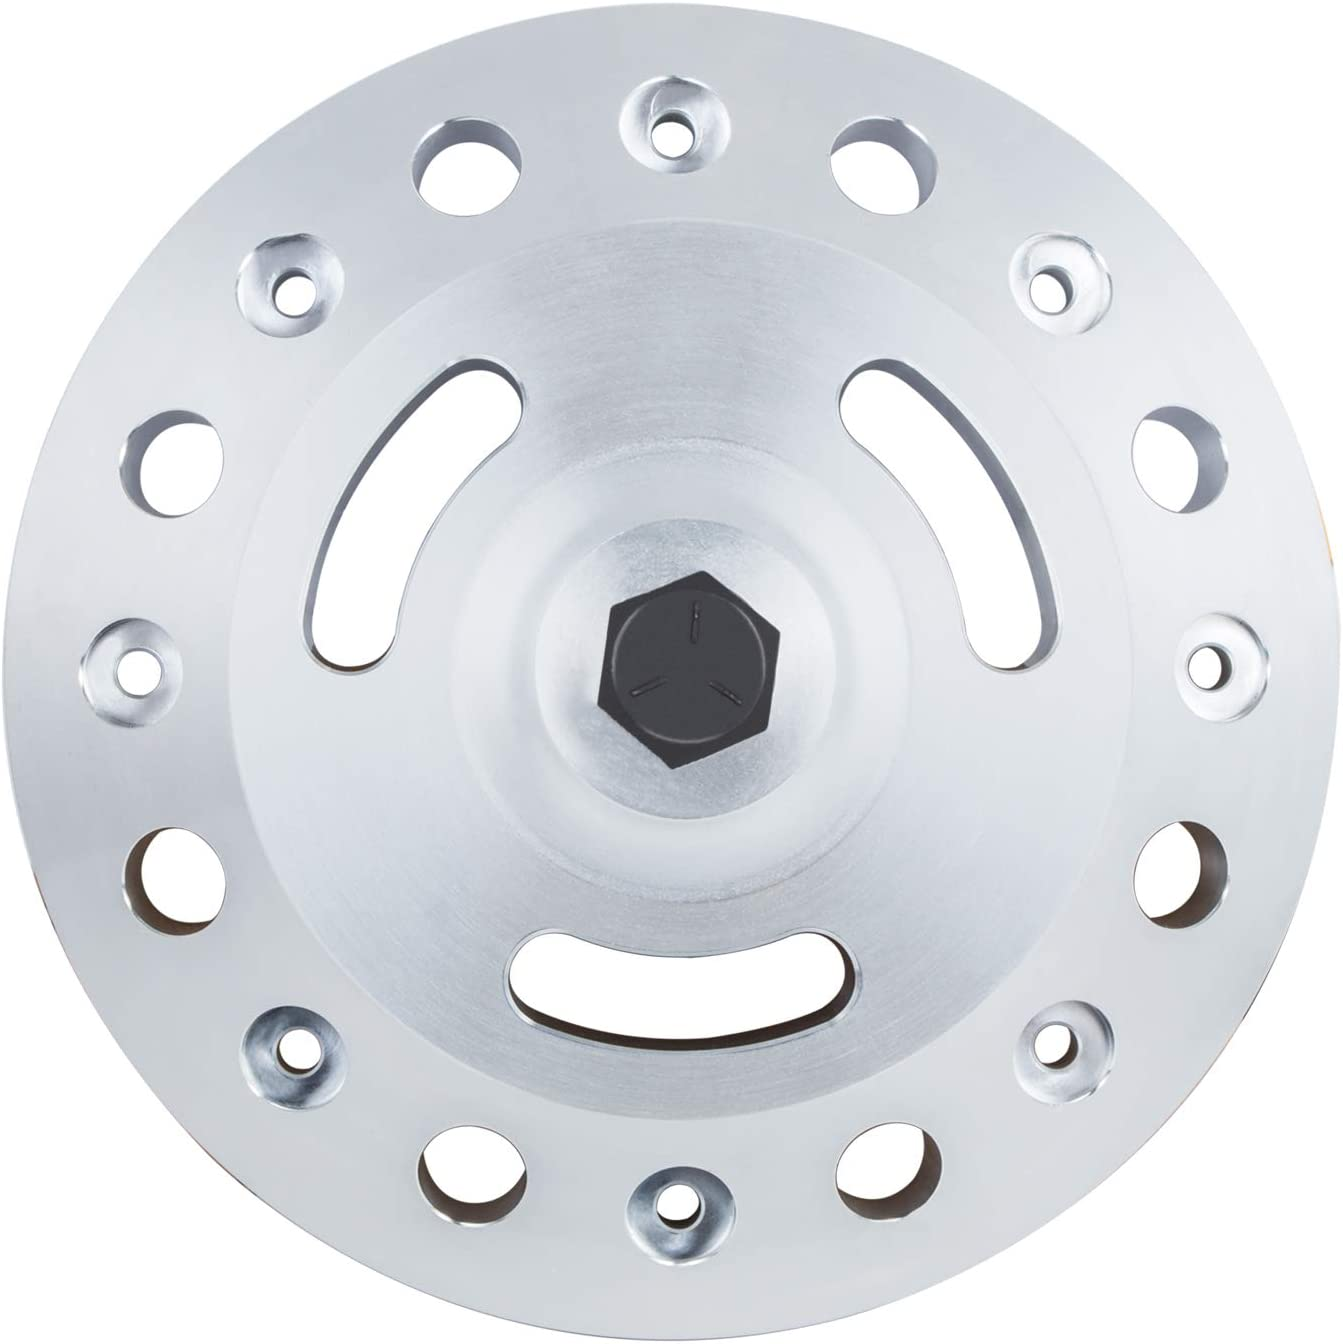 Yoursme 3162992 Front Crankshaft Seal Remover /& Installer Tool for Cummins Diesel ISX /& QSX Alternative to OEM 3162992